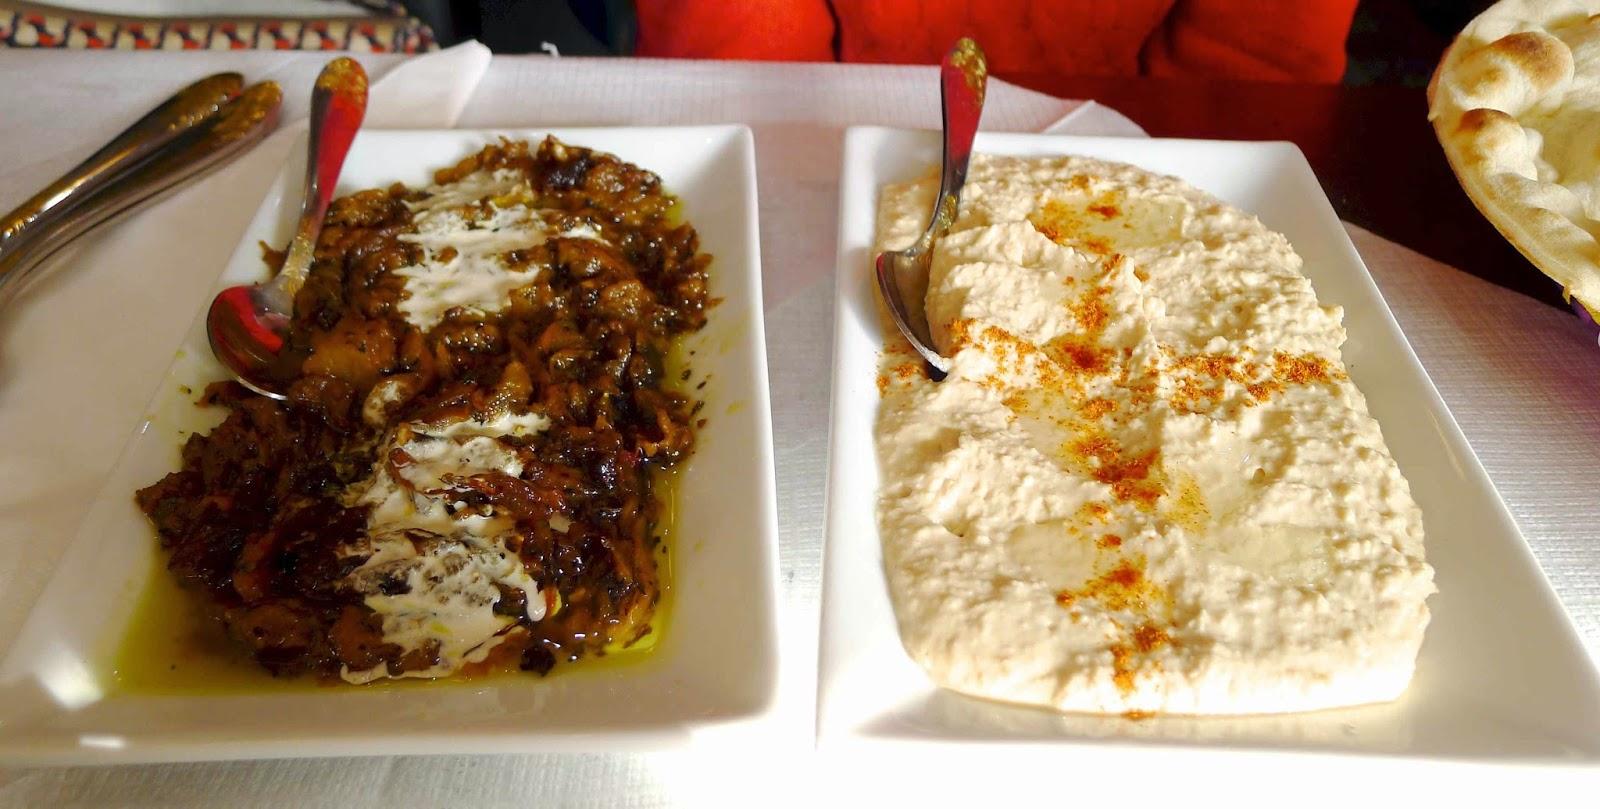 Gourmetgorro lana cardiff persian restaurant review for Ahmads persian cuisine